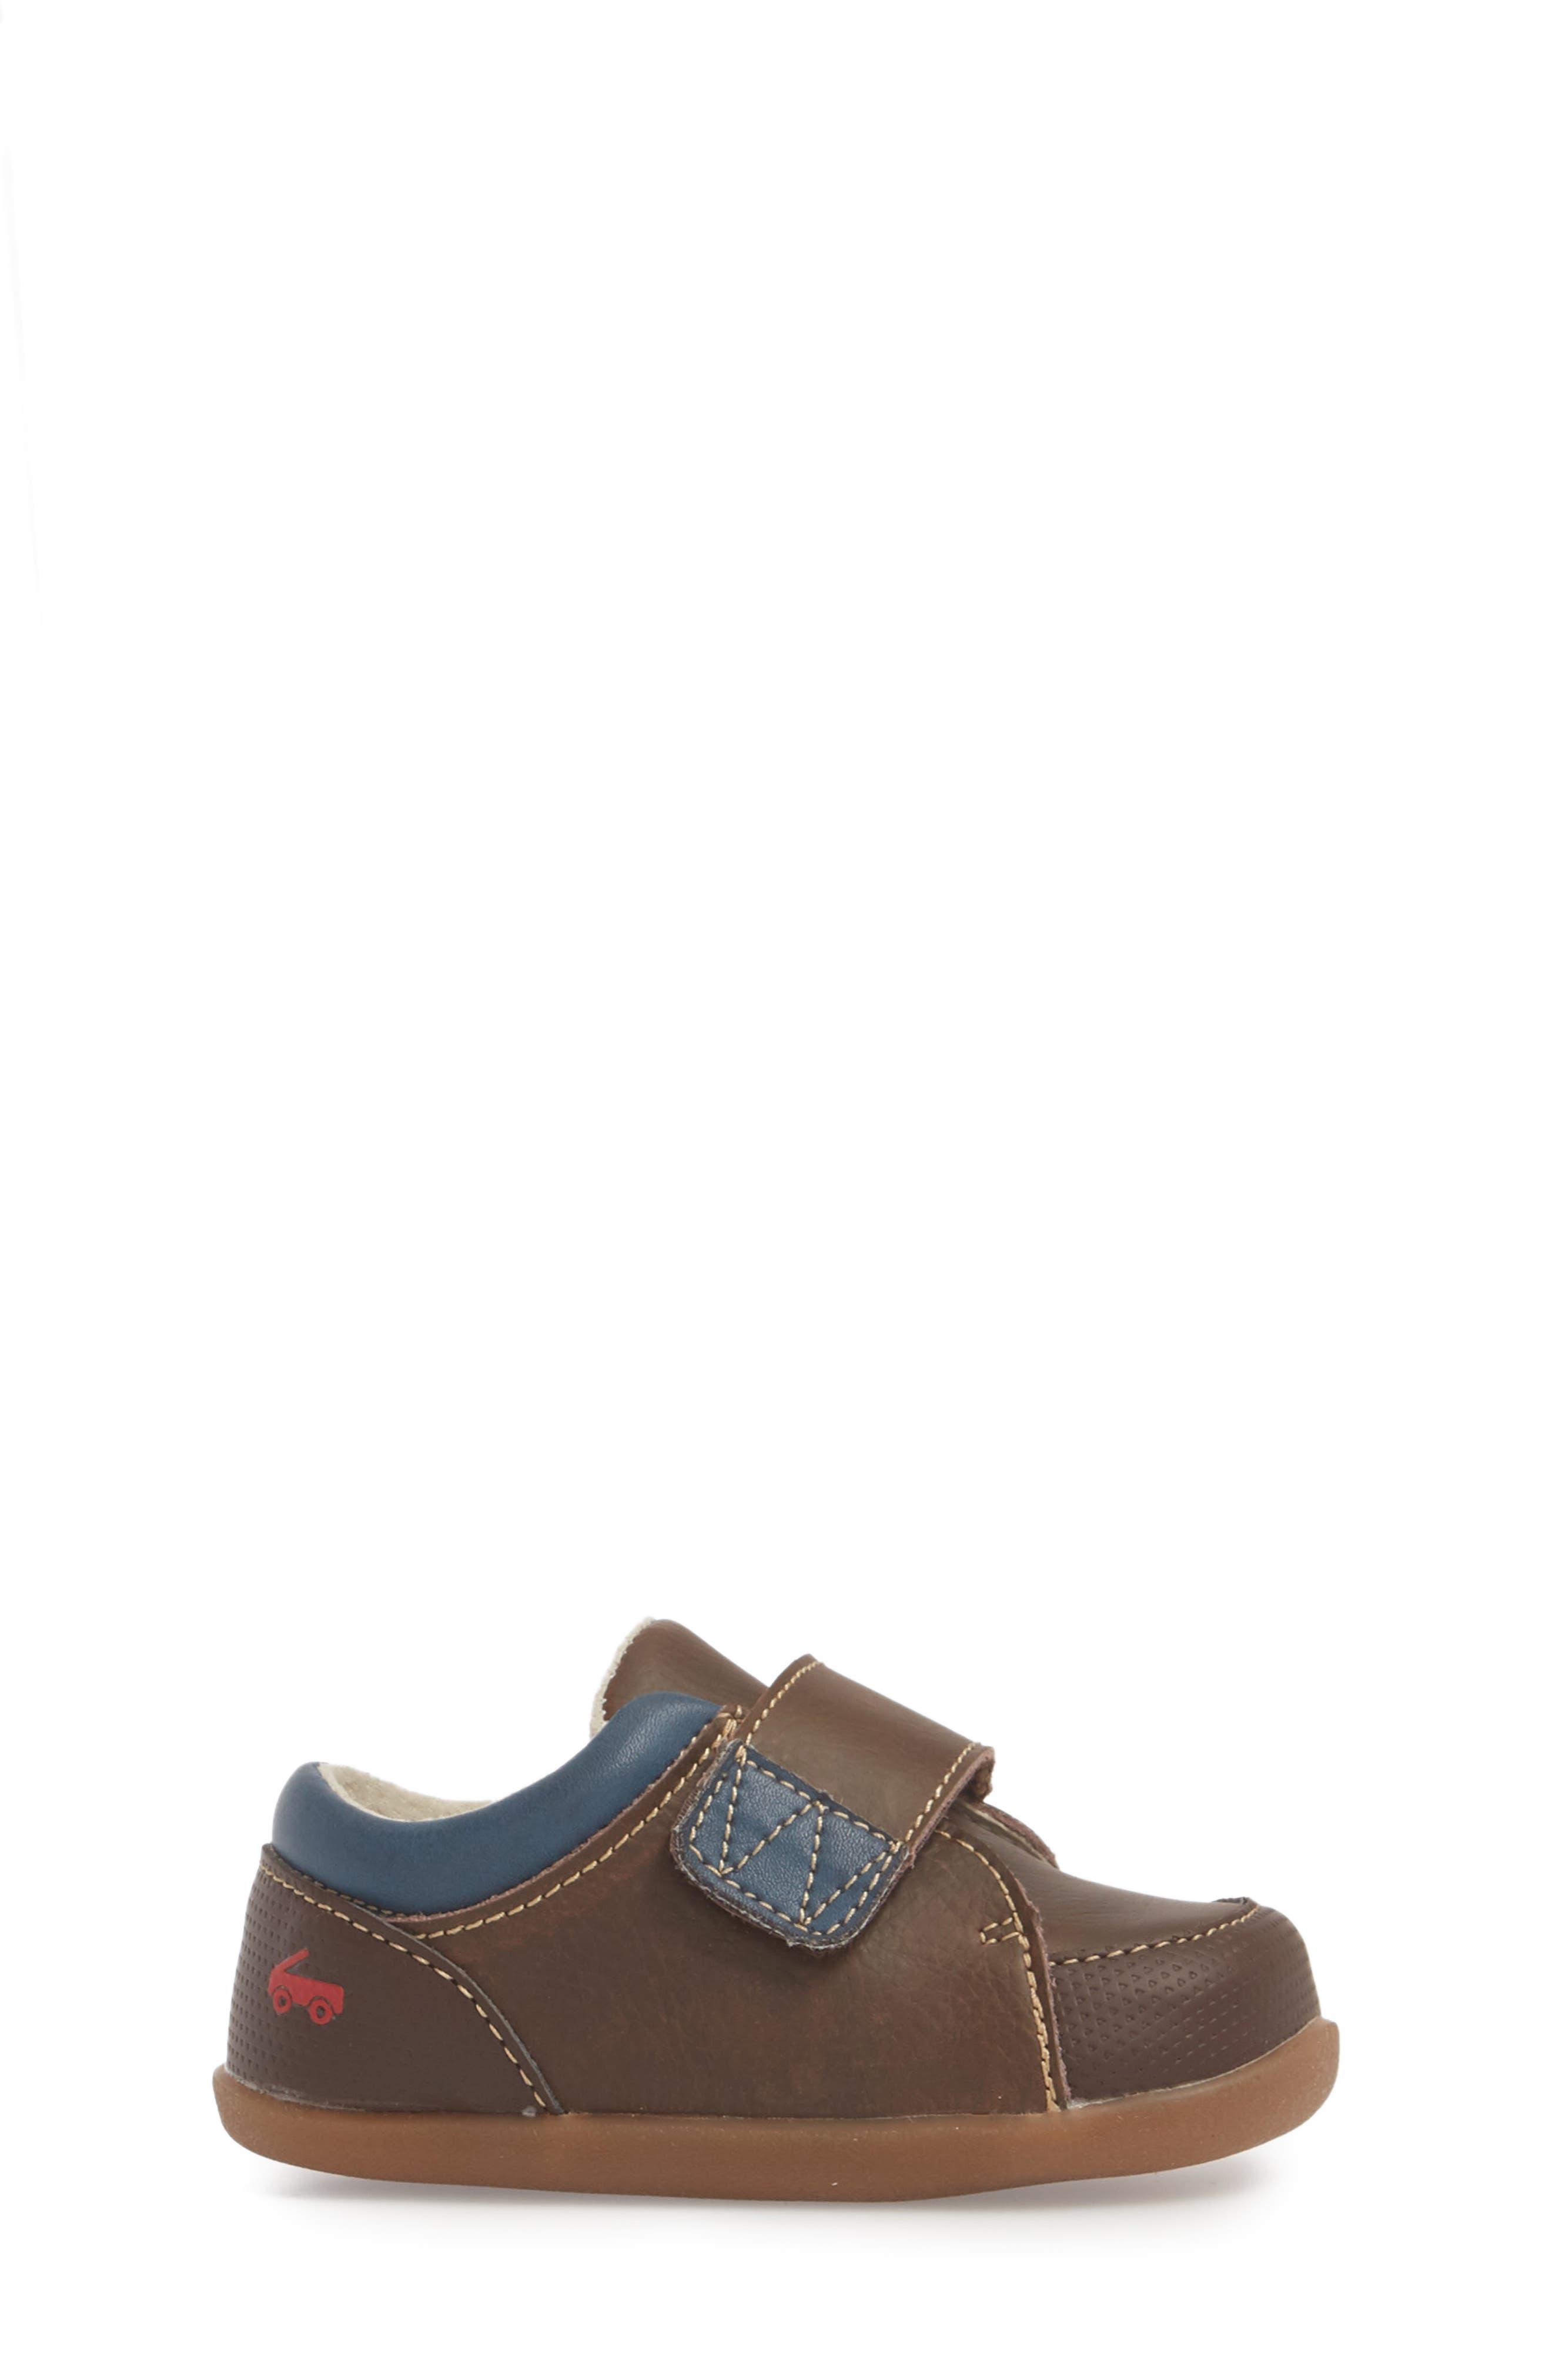 Graham Sneaker,                             Alternate thumbnail 3, color,                             BROWN